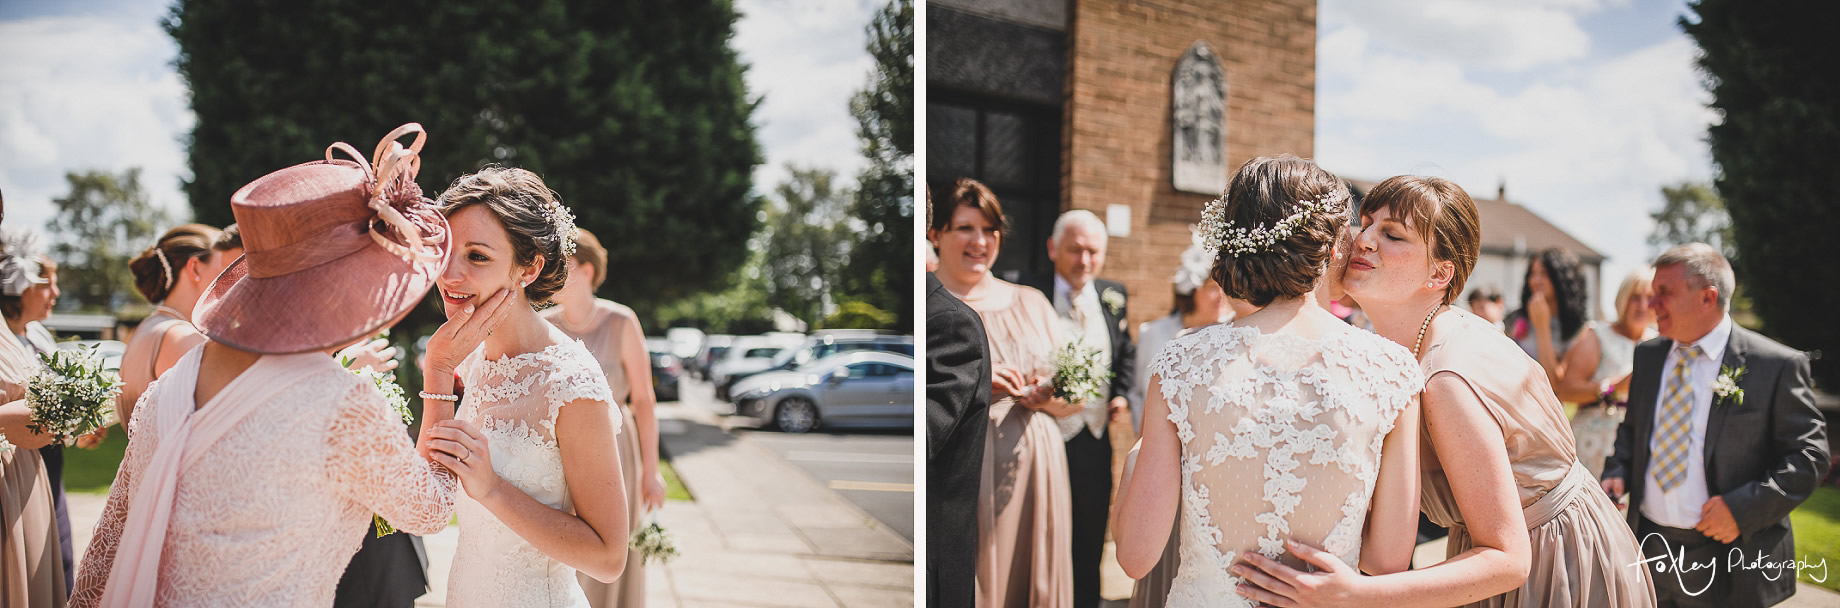 Rebecca and Dan Wedding at Preston Marriott Hotel 067